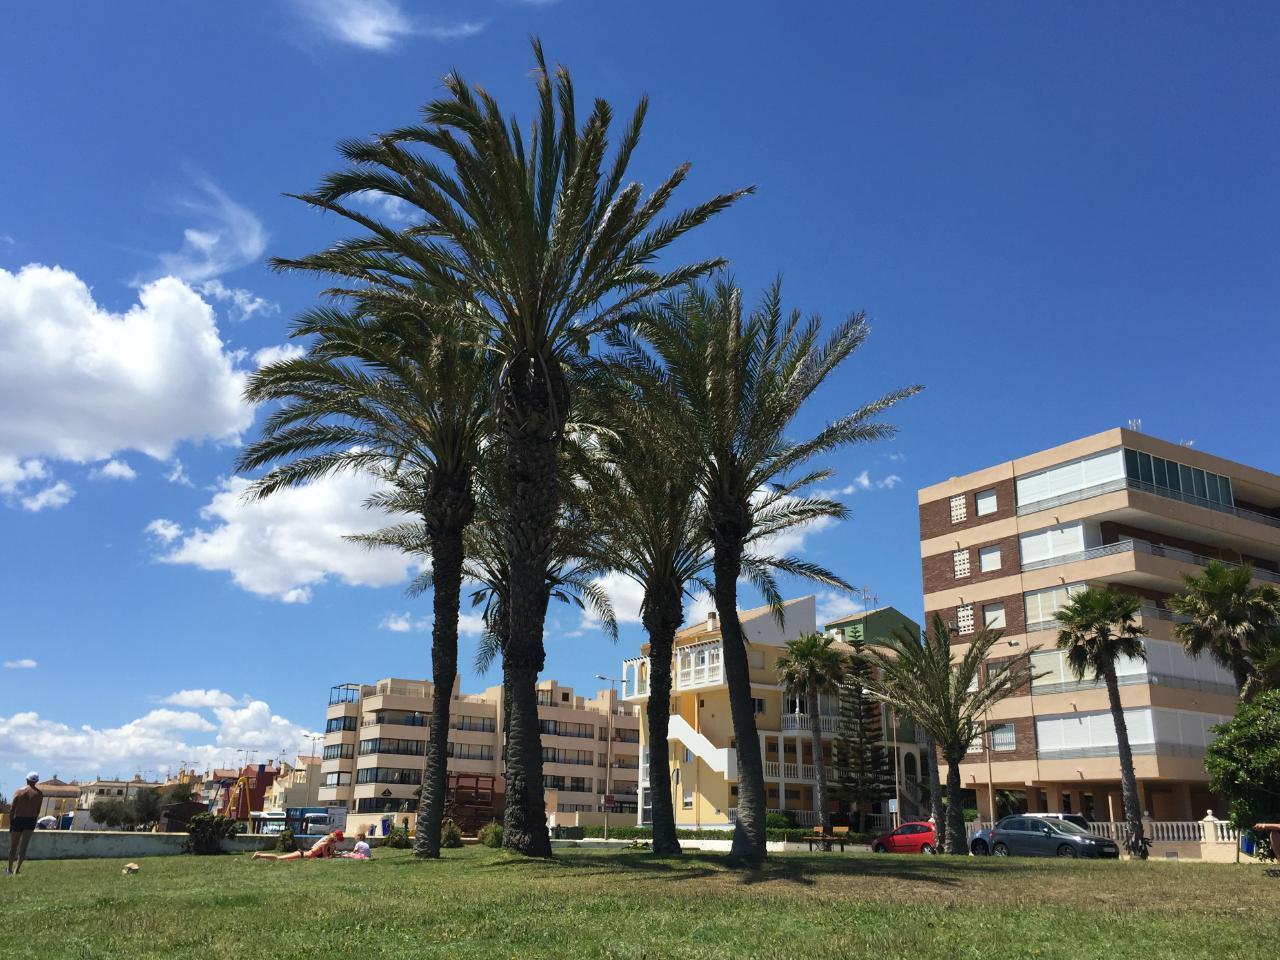 Appartement de vacances Sonnige 3.5 Zi-Wohnung am Meer (1026876), Torrevieja, Costa Blanca, Valence, Espagne, image 4